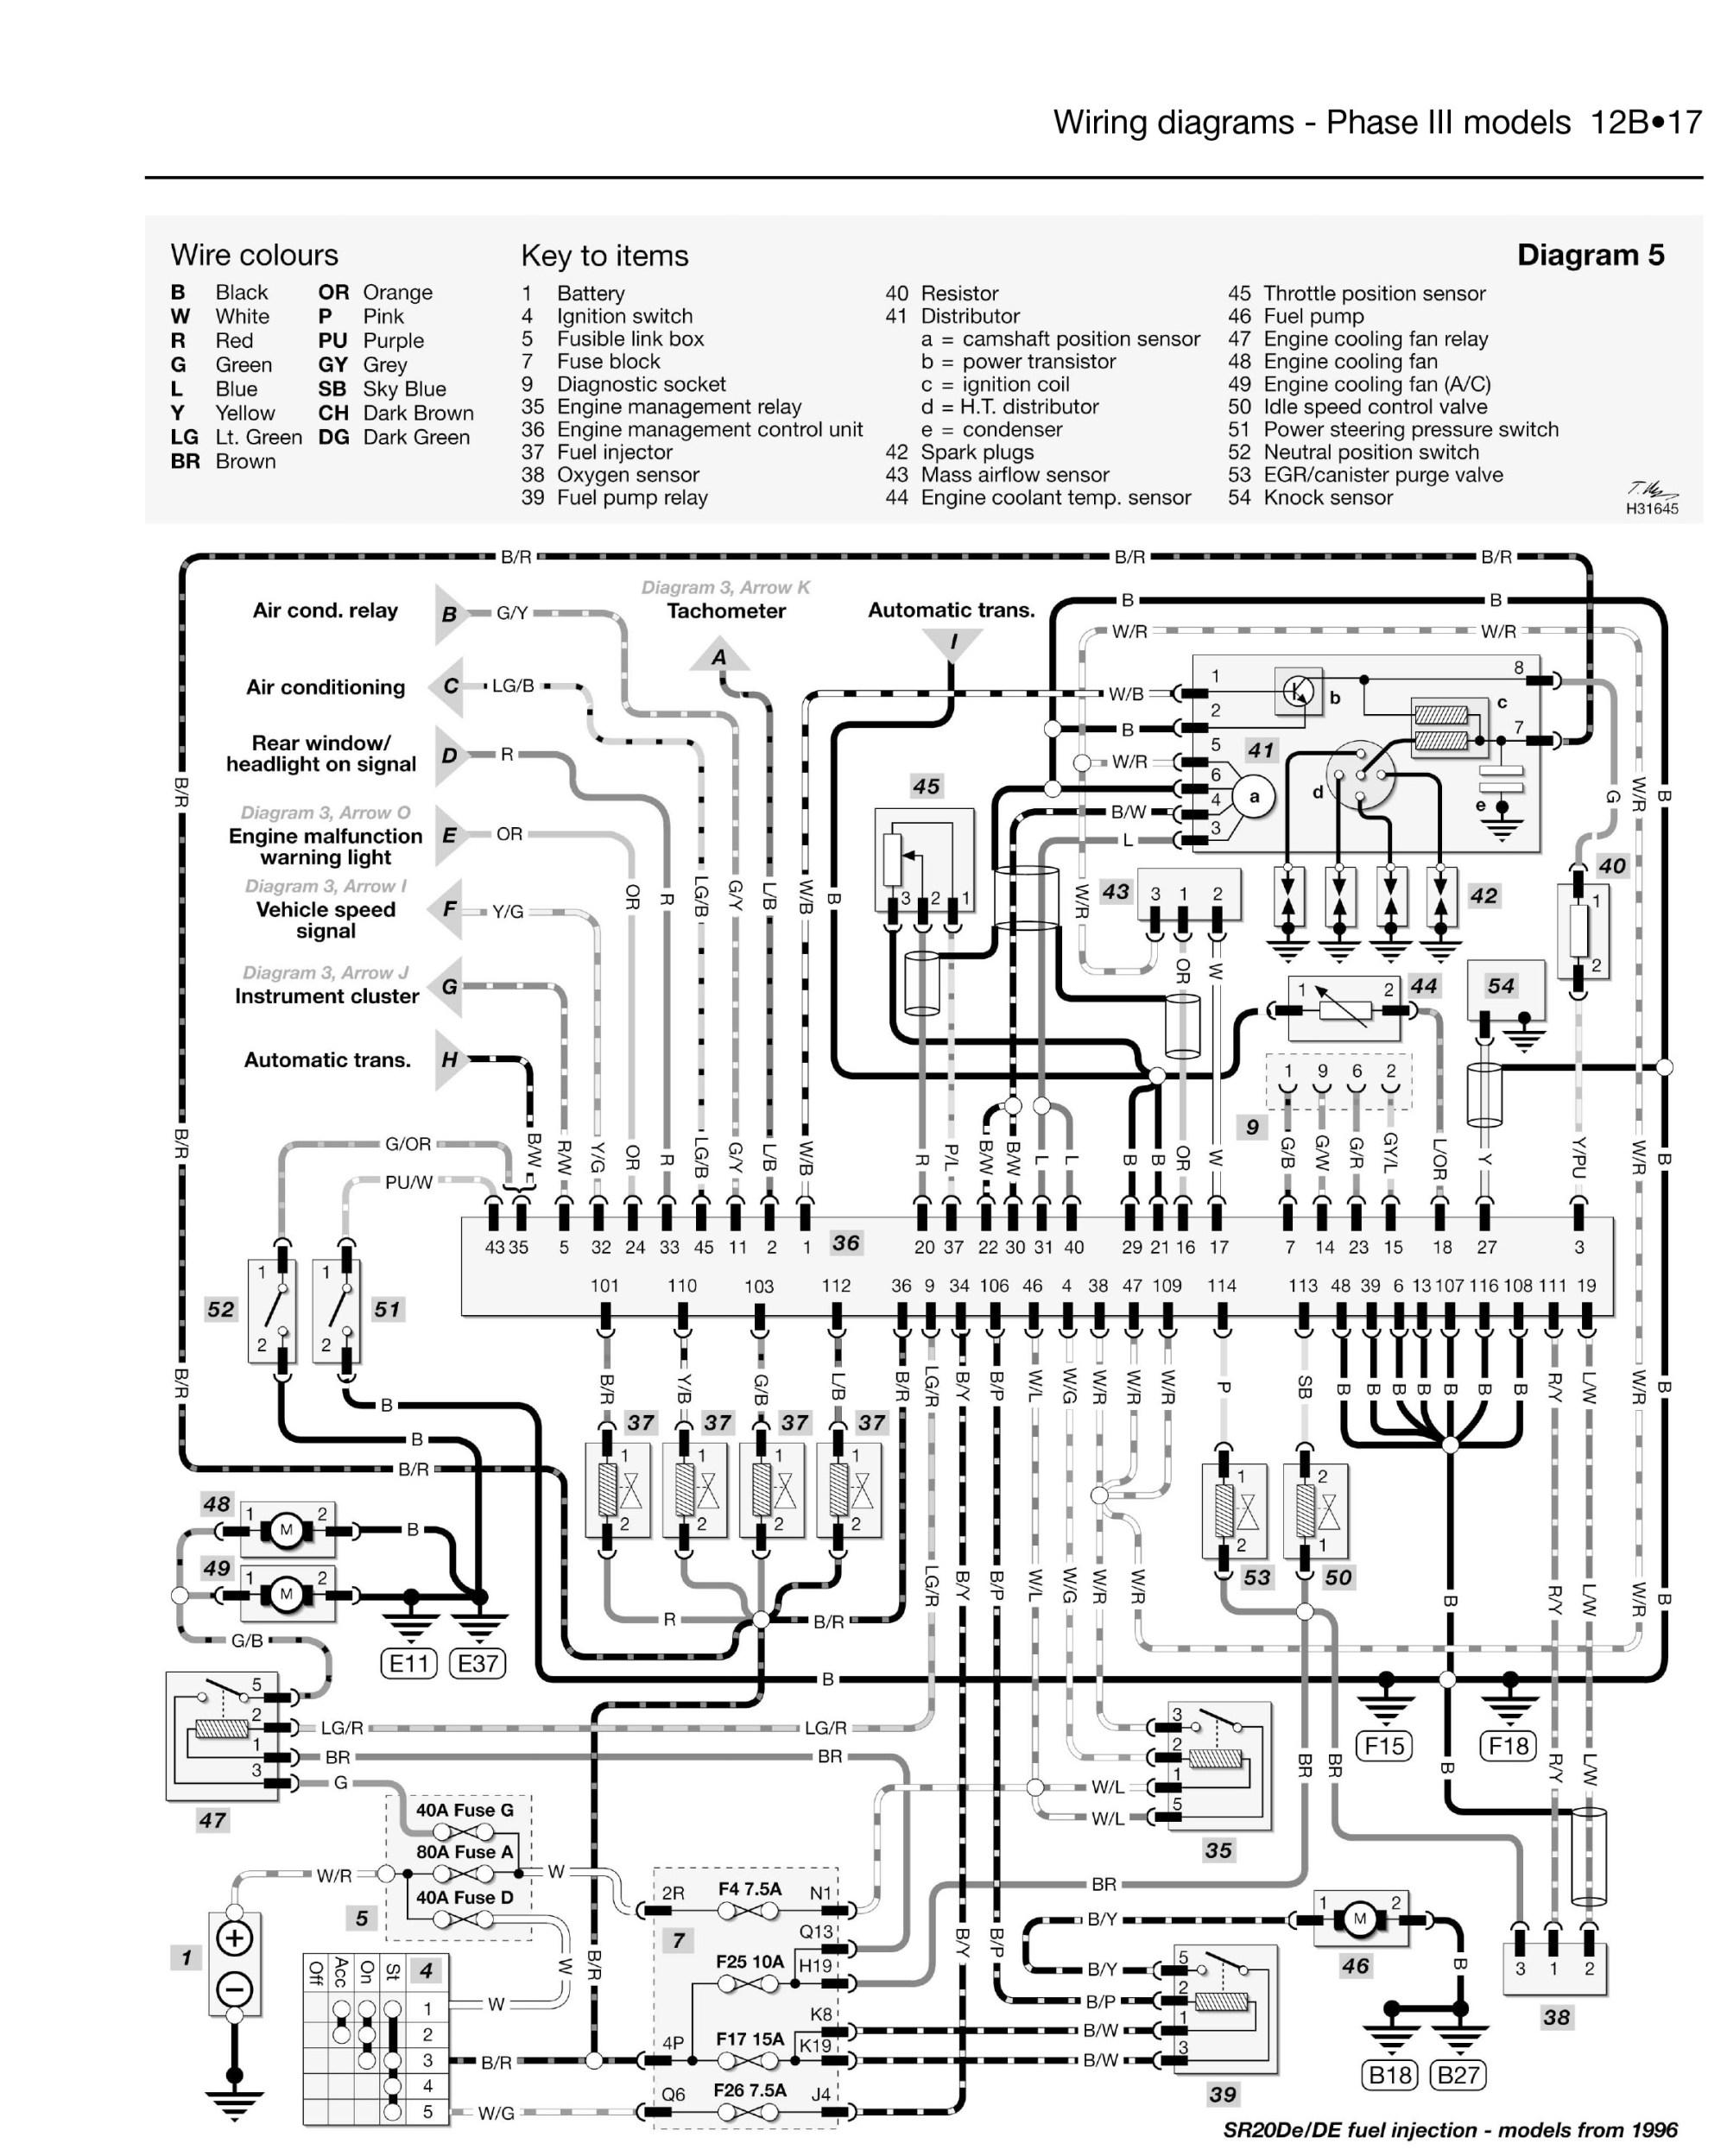 hight resolution of nissan primera wiring diagram manual wiring diagram data nissan primera wiring diagram nissan primera wiring diagram